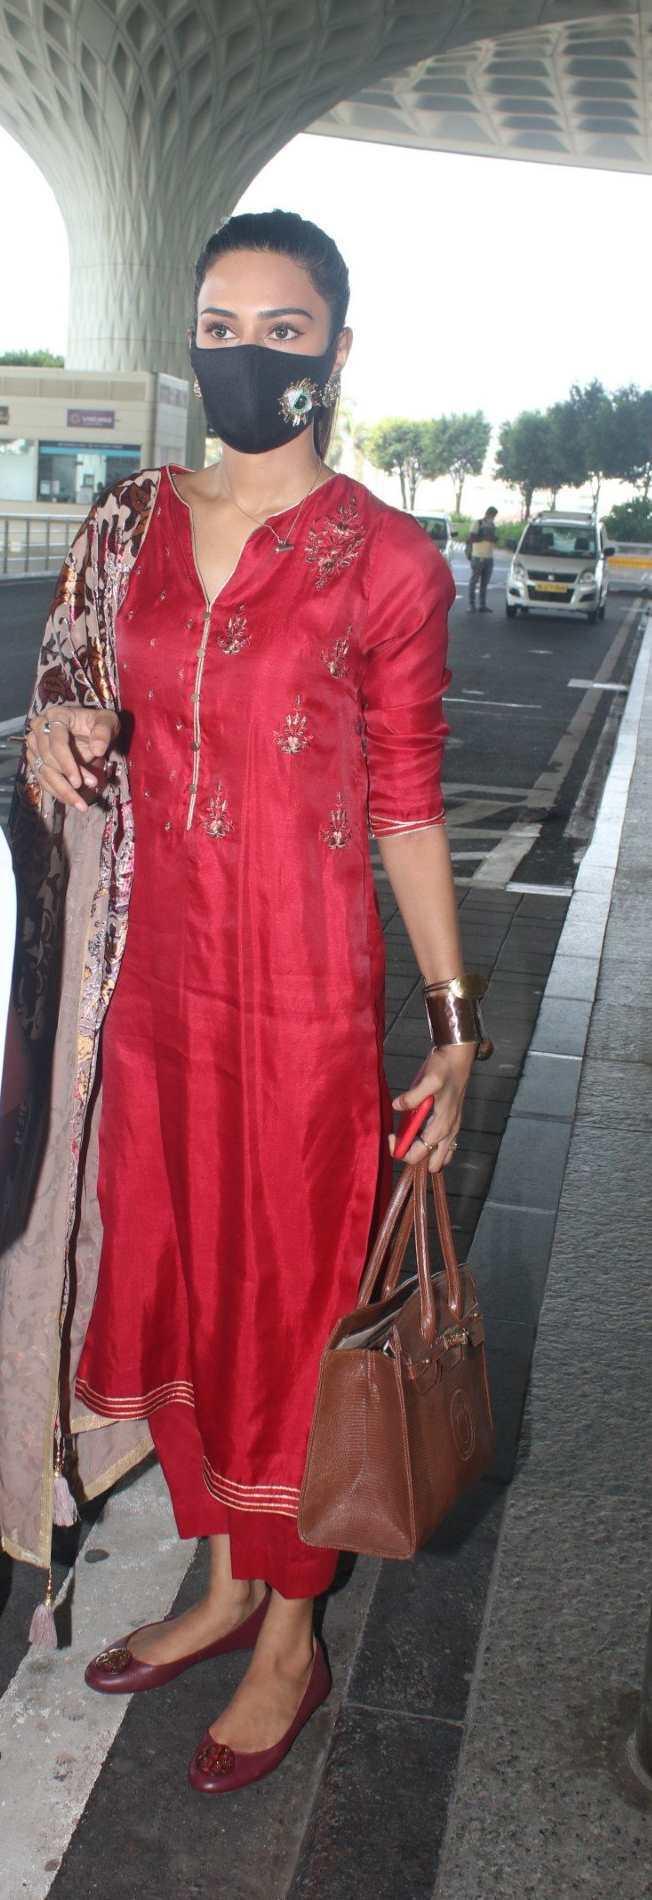 Erica fernandez in red kurta set outside airport departure-3